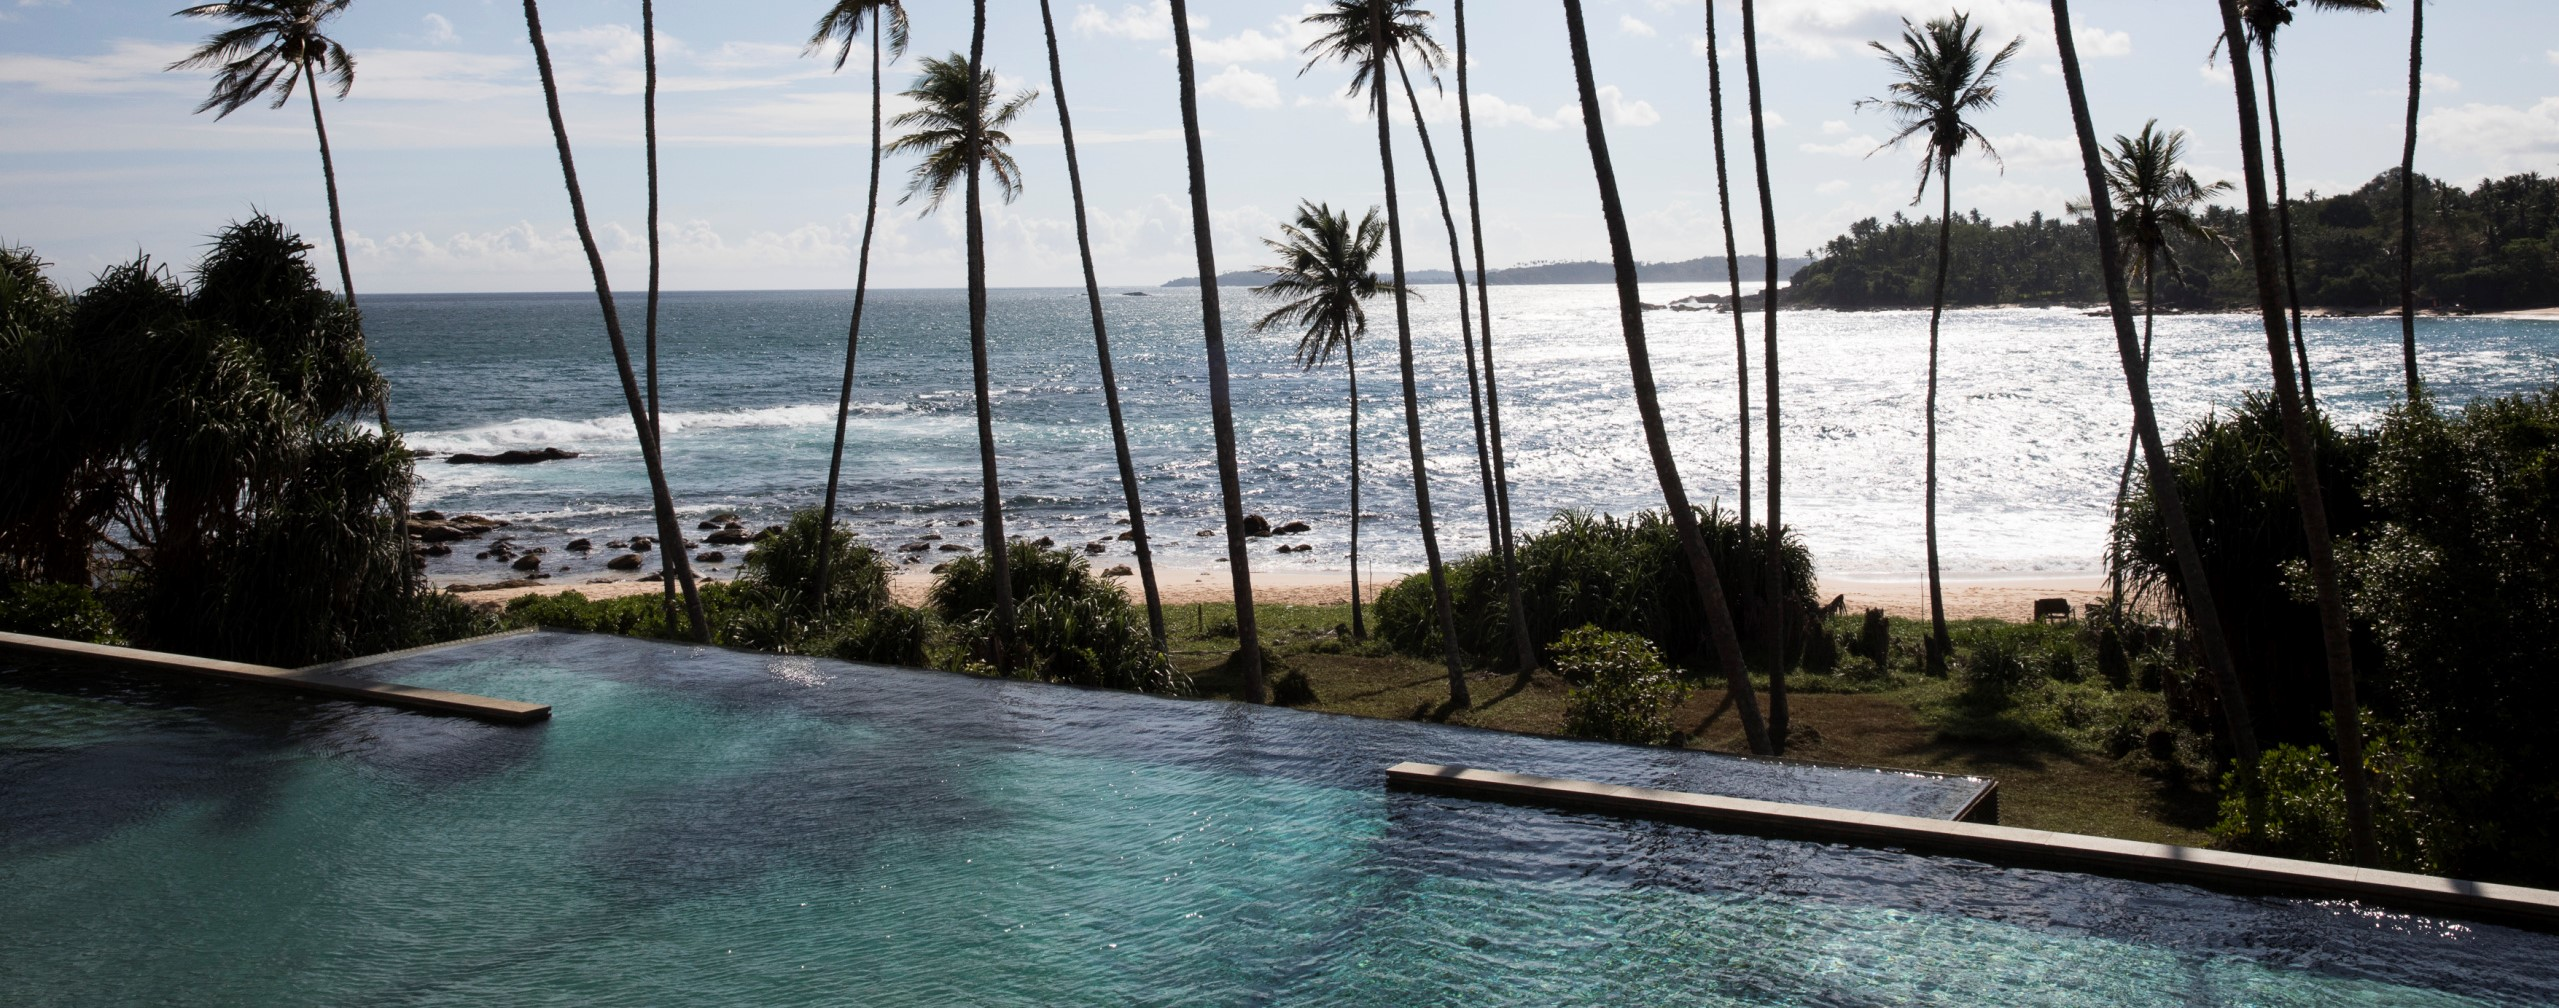 amanwella-view-from-swimming-pool